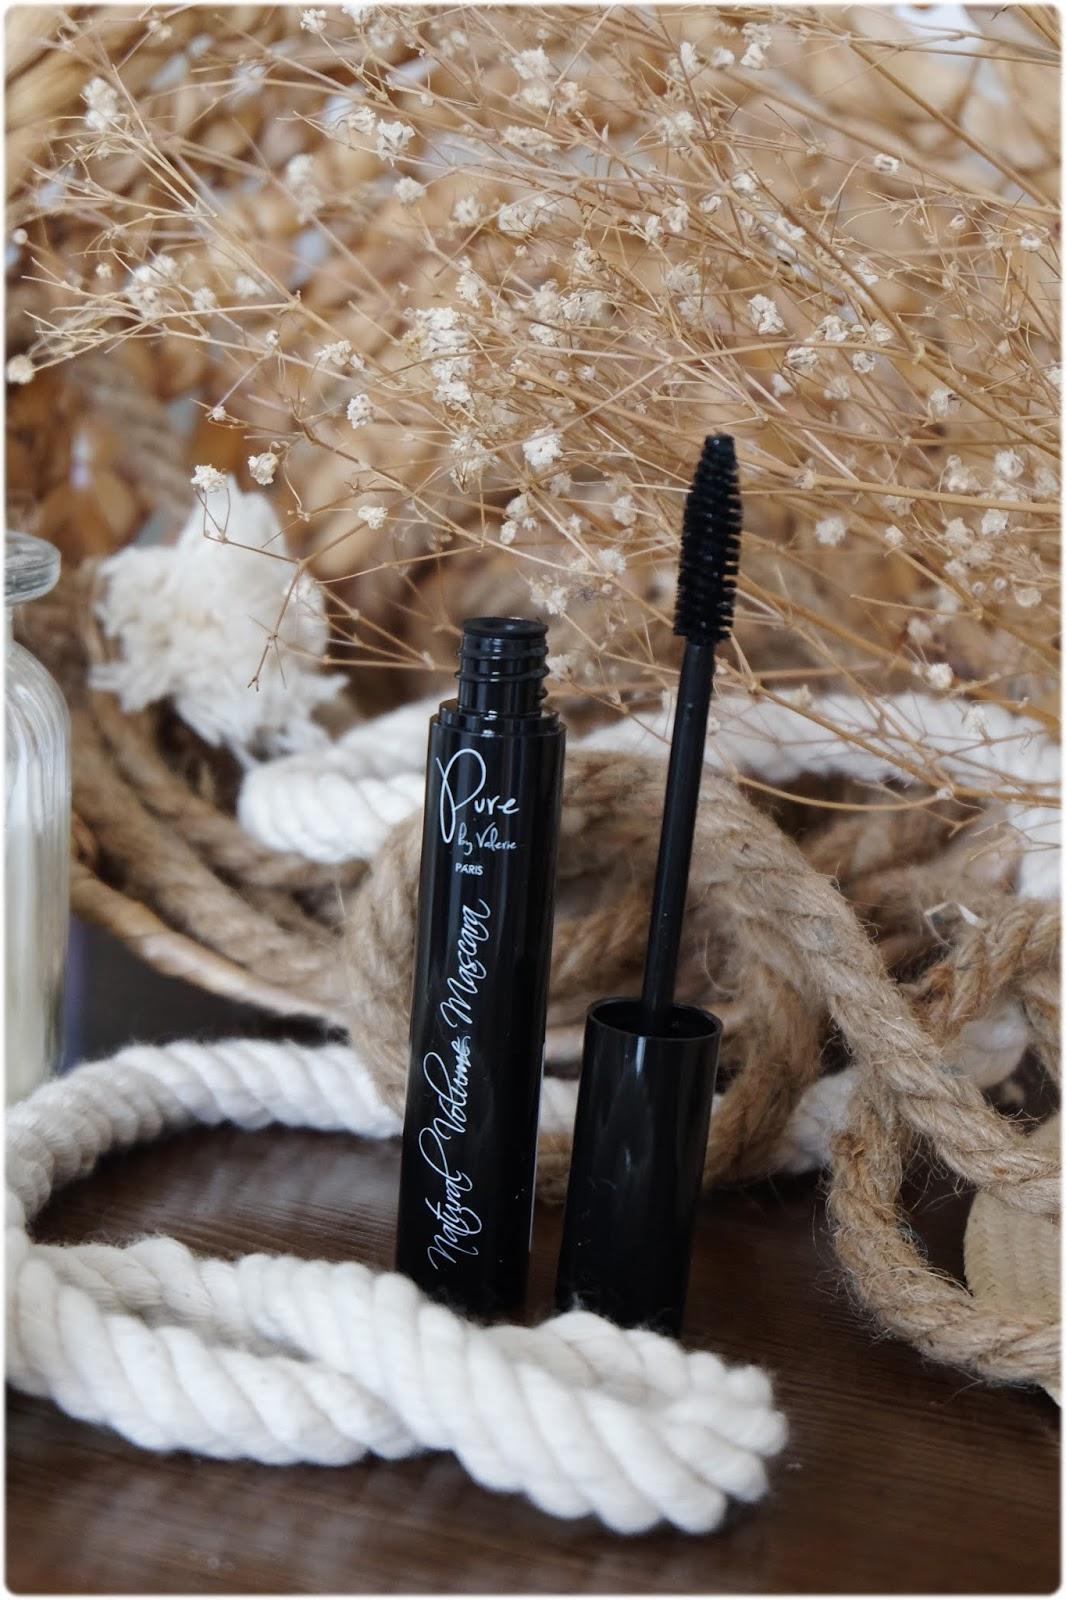 mascara Pure by valérie naturel volume BIOTYfull box mai 2020